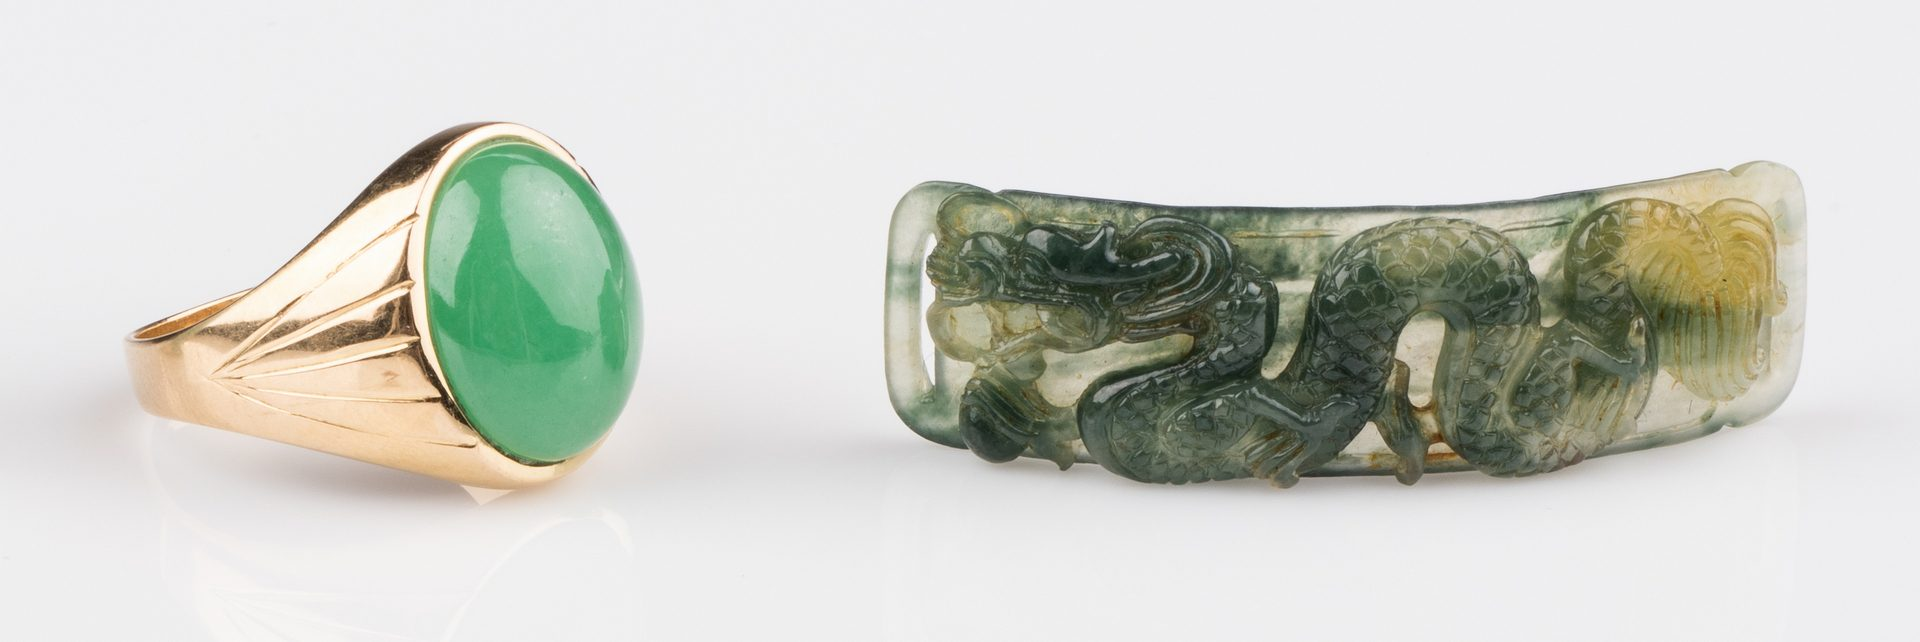 Lot 660: 18K Apple Green Jade Ring + 2 Plaques